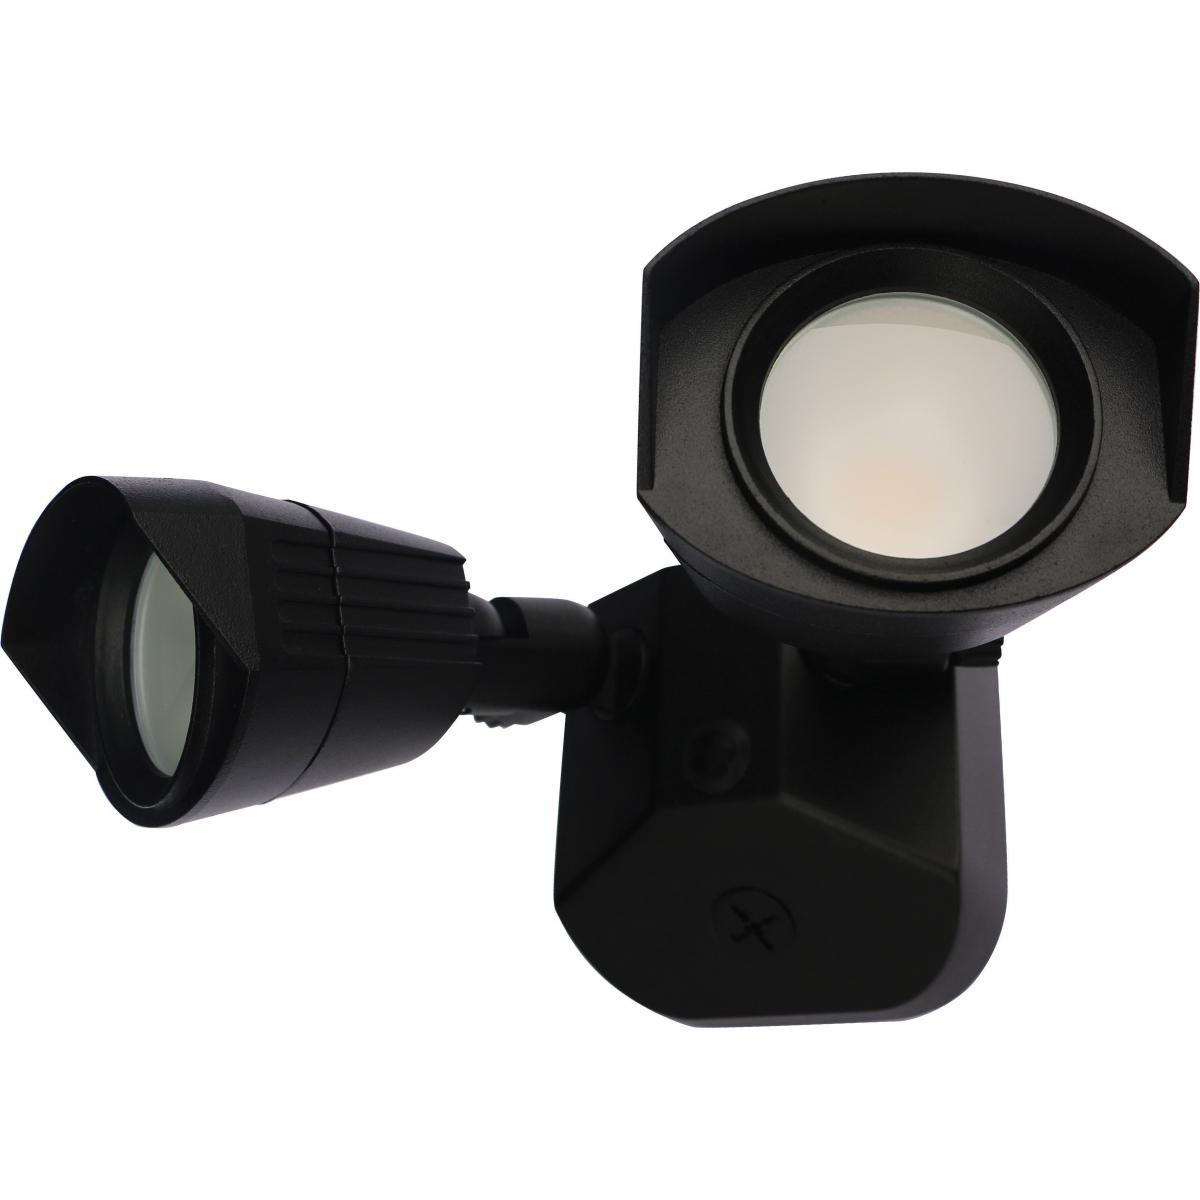 65-220 LED DUAL HEAD SECURITY LIGHT